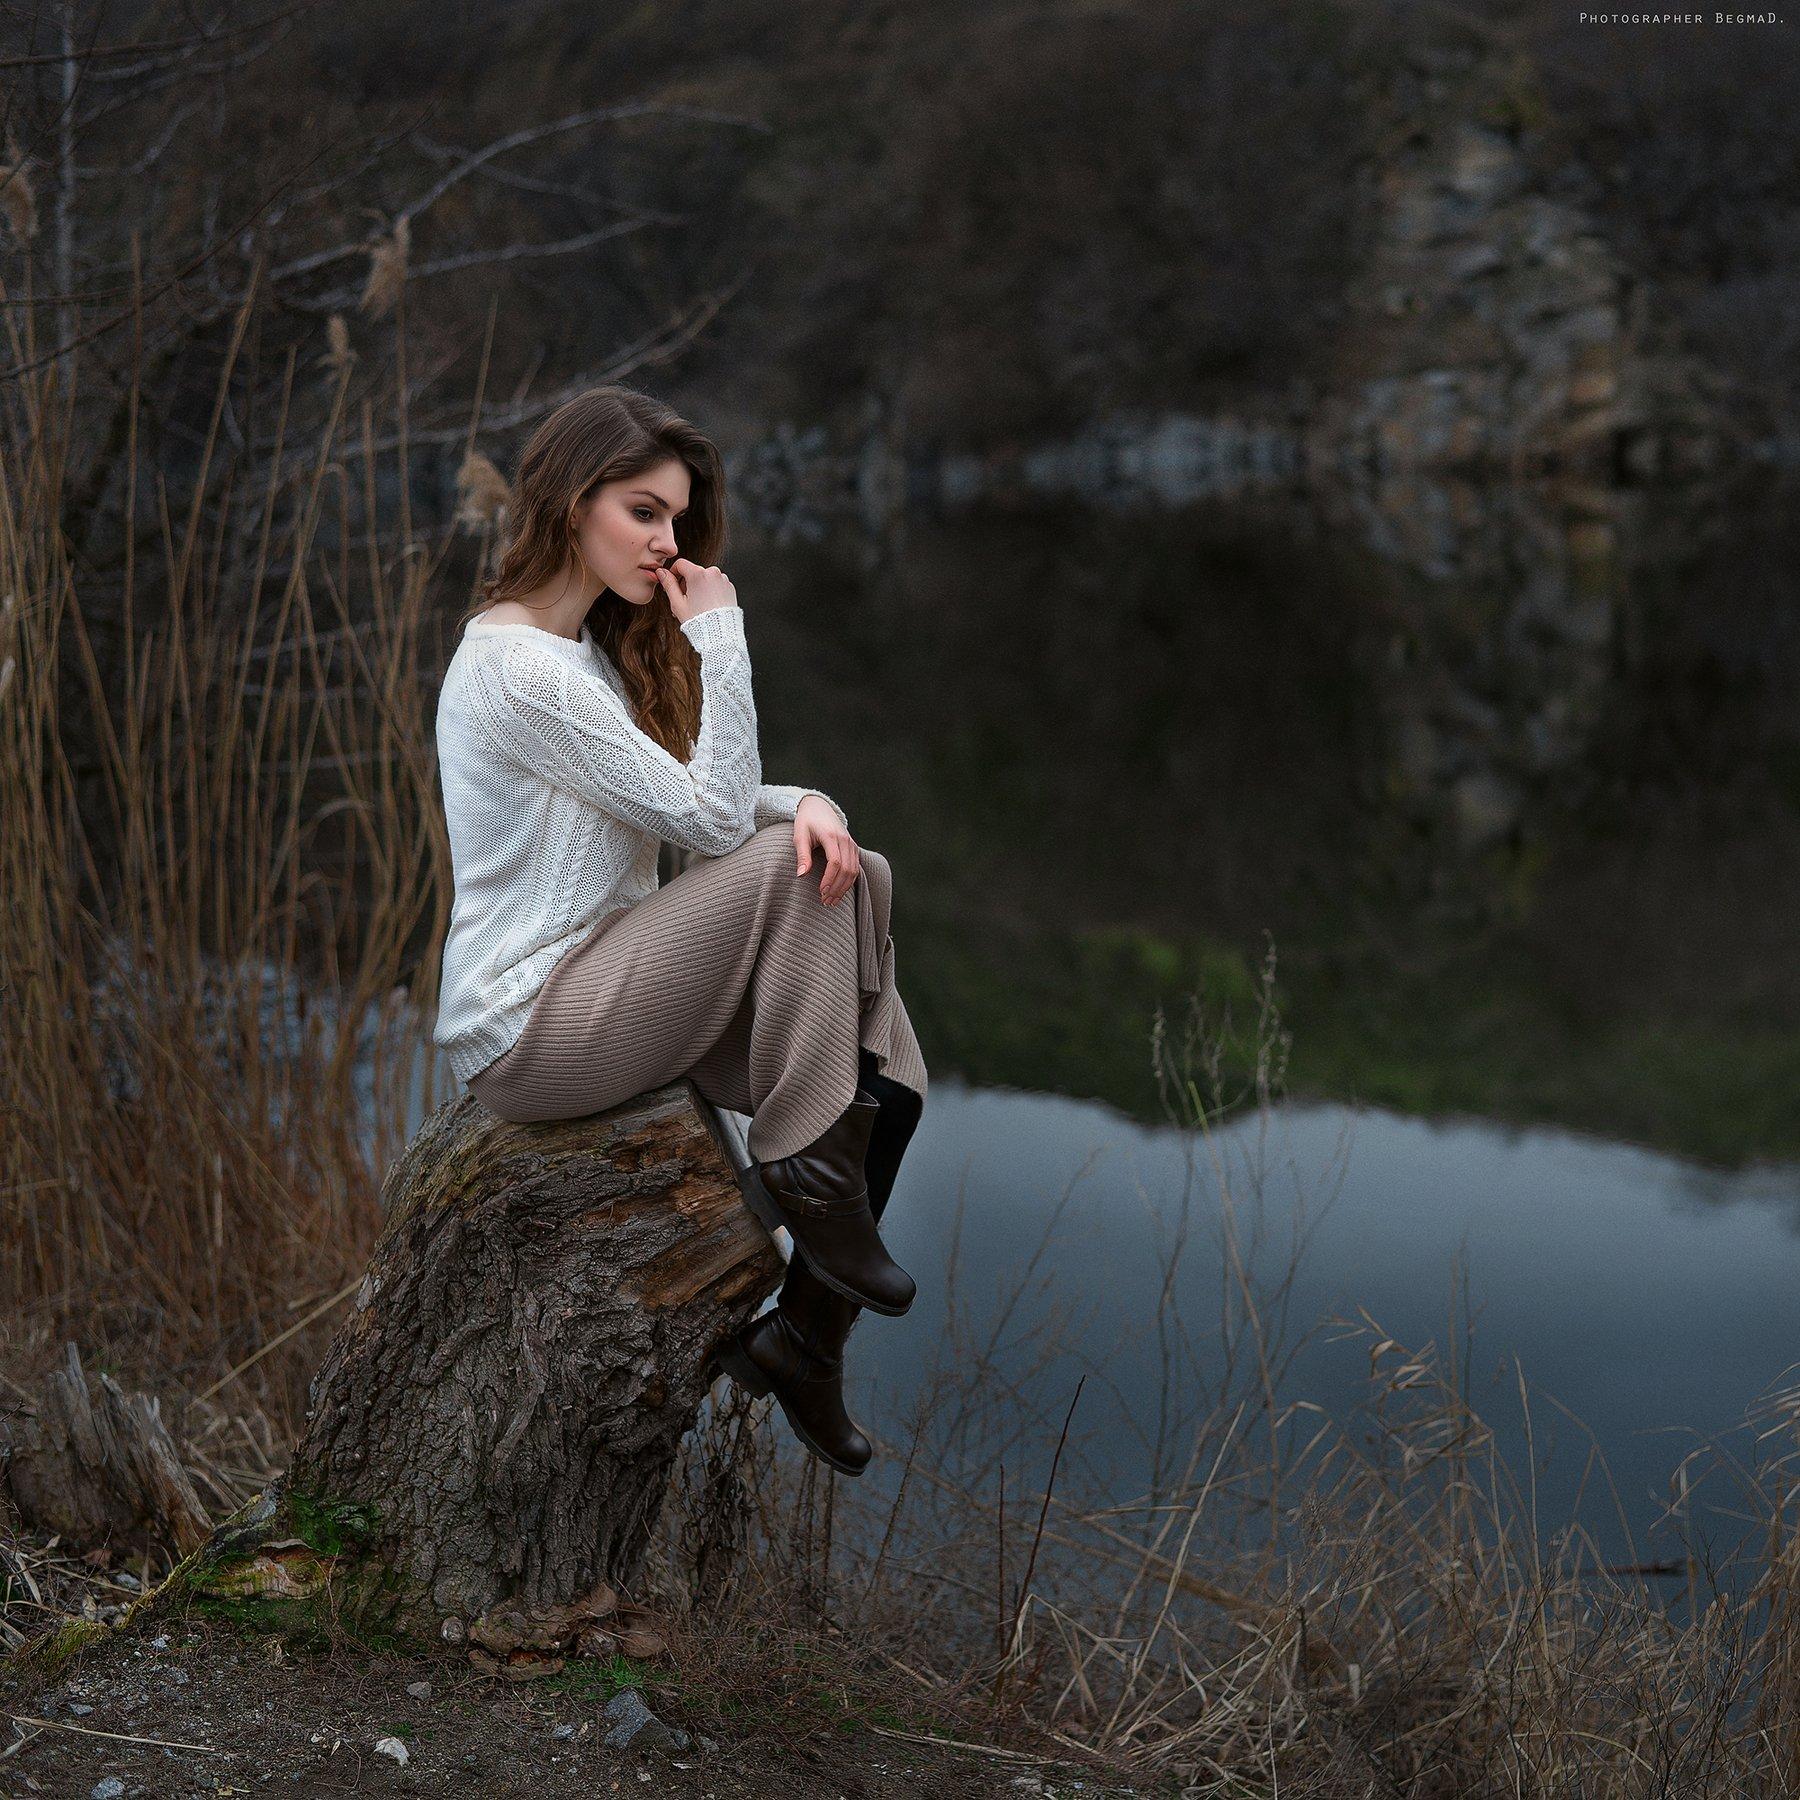 Art photo, Atmospheric, Beautiful, BegmaD, Color, D610, Dantar90, Girl, Landscape, Model, Nikon, Portrait, Атмосферное фото, Портрет, Дмитрий Бегма